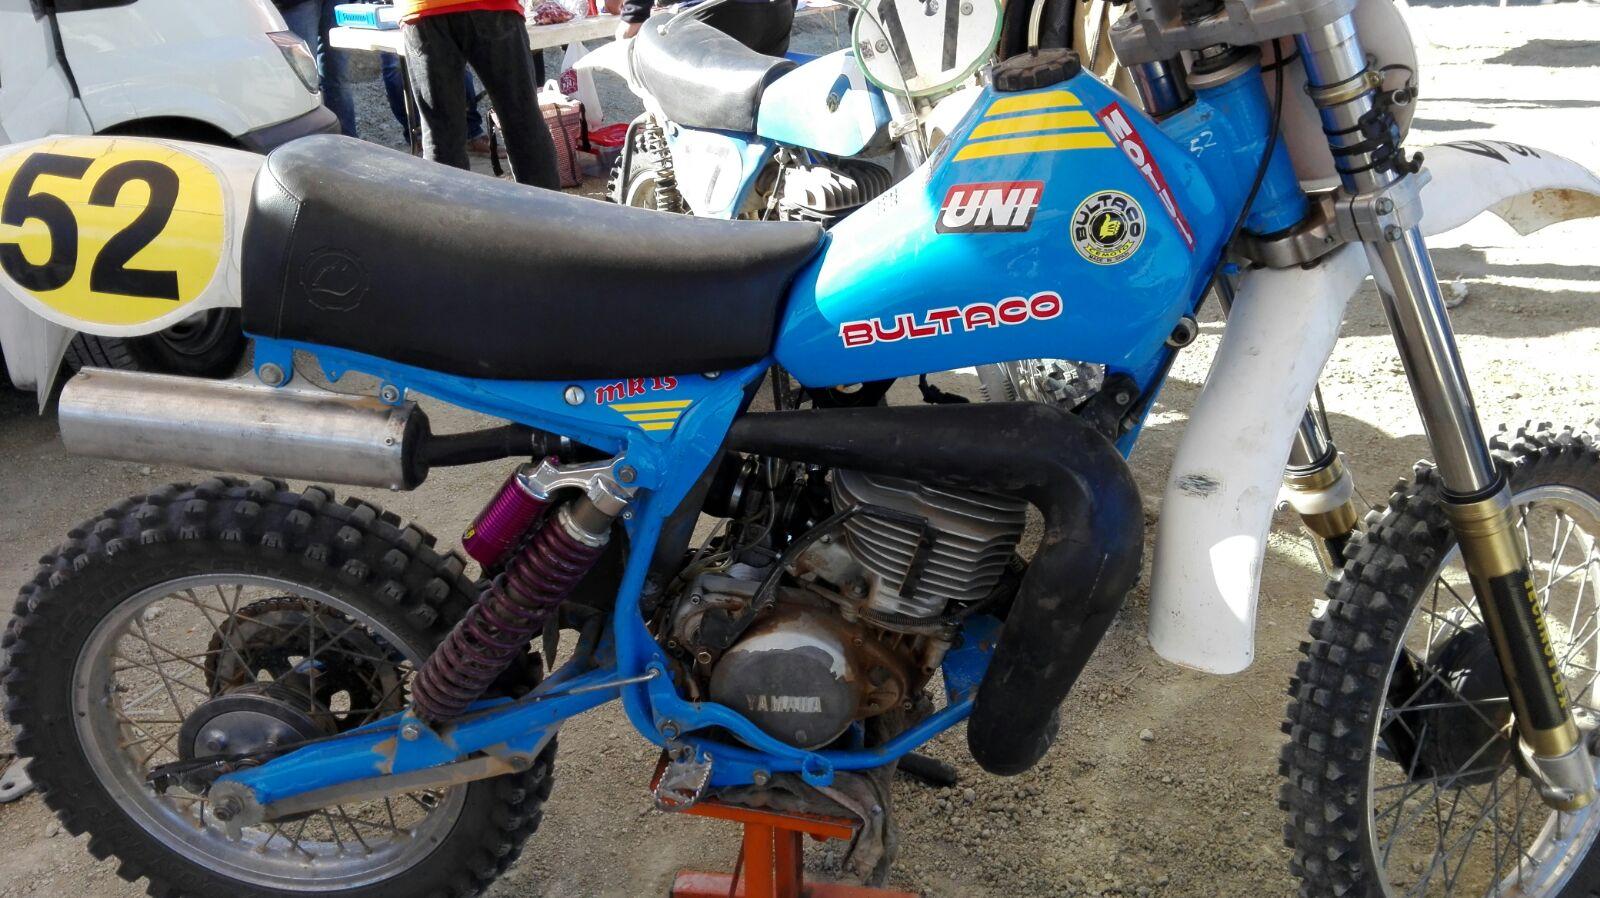 Pursang motor Yamaha 23mwr29